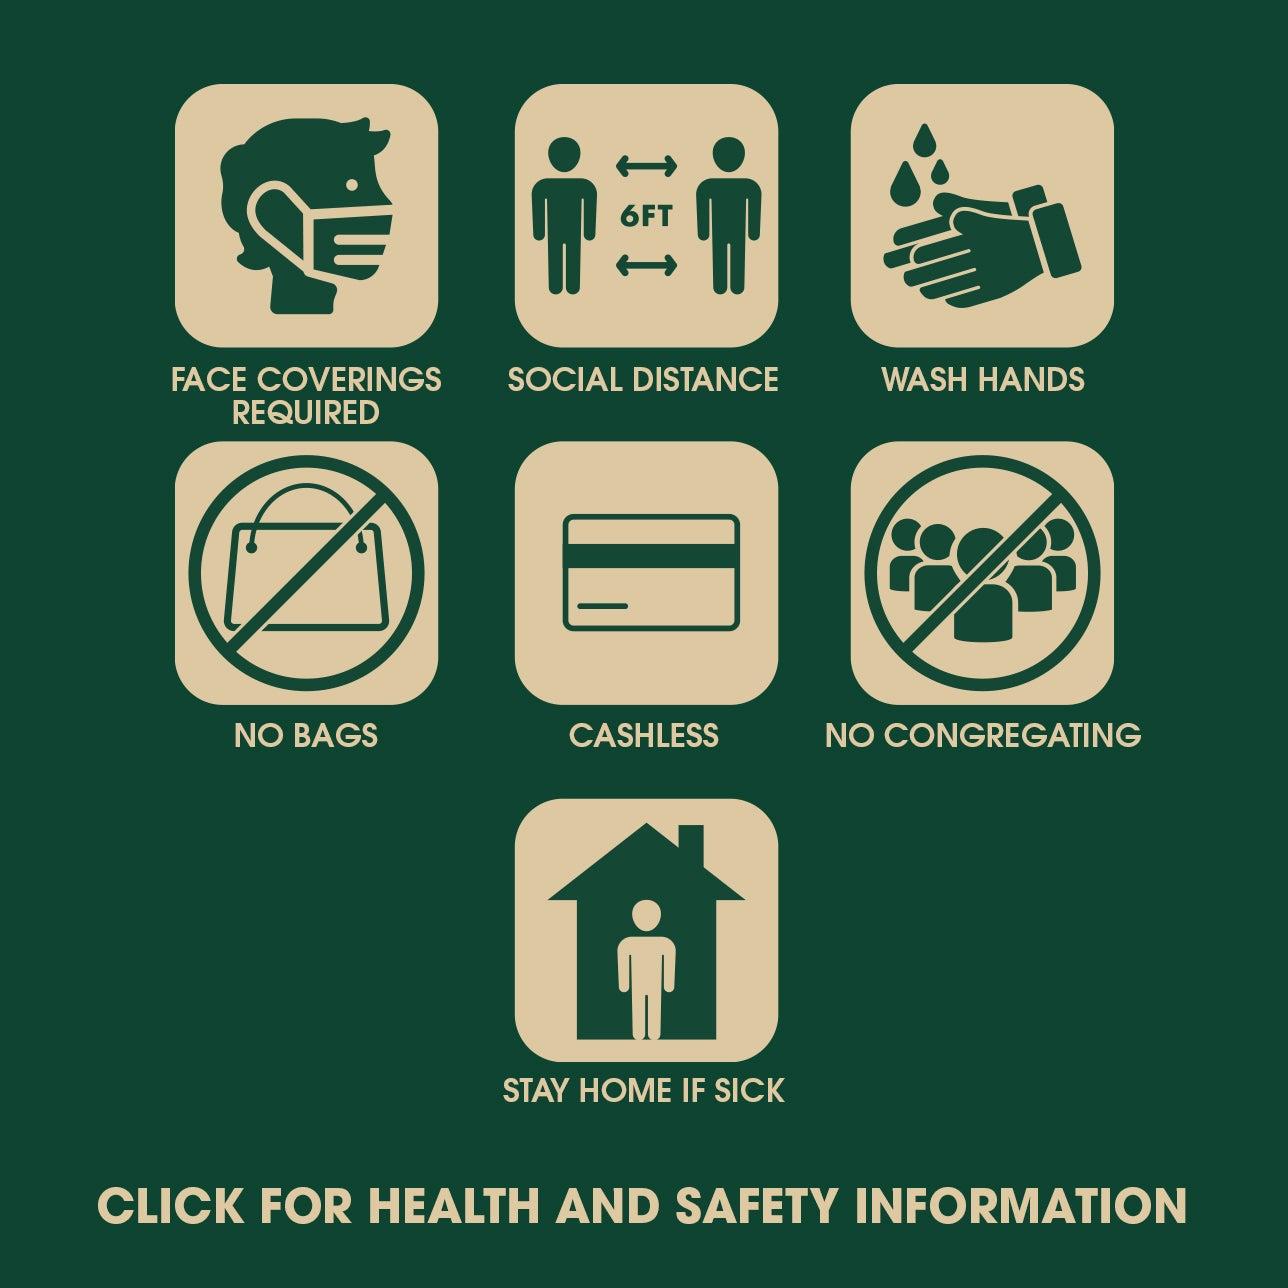 XEC_SafetyMessage_1288x1288_v3.jpg